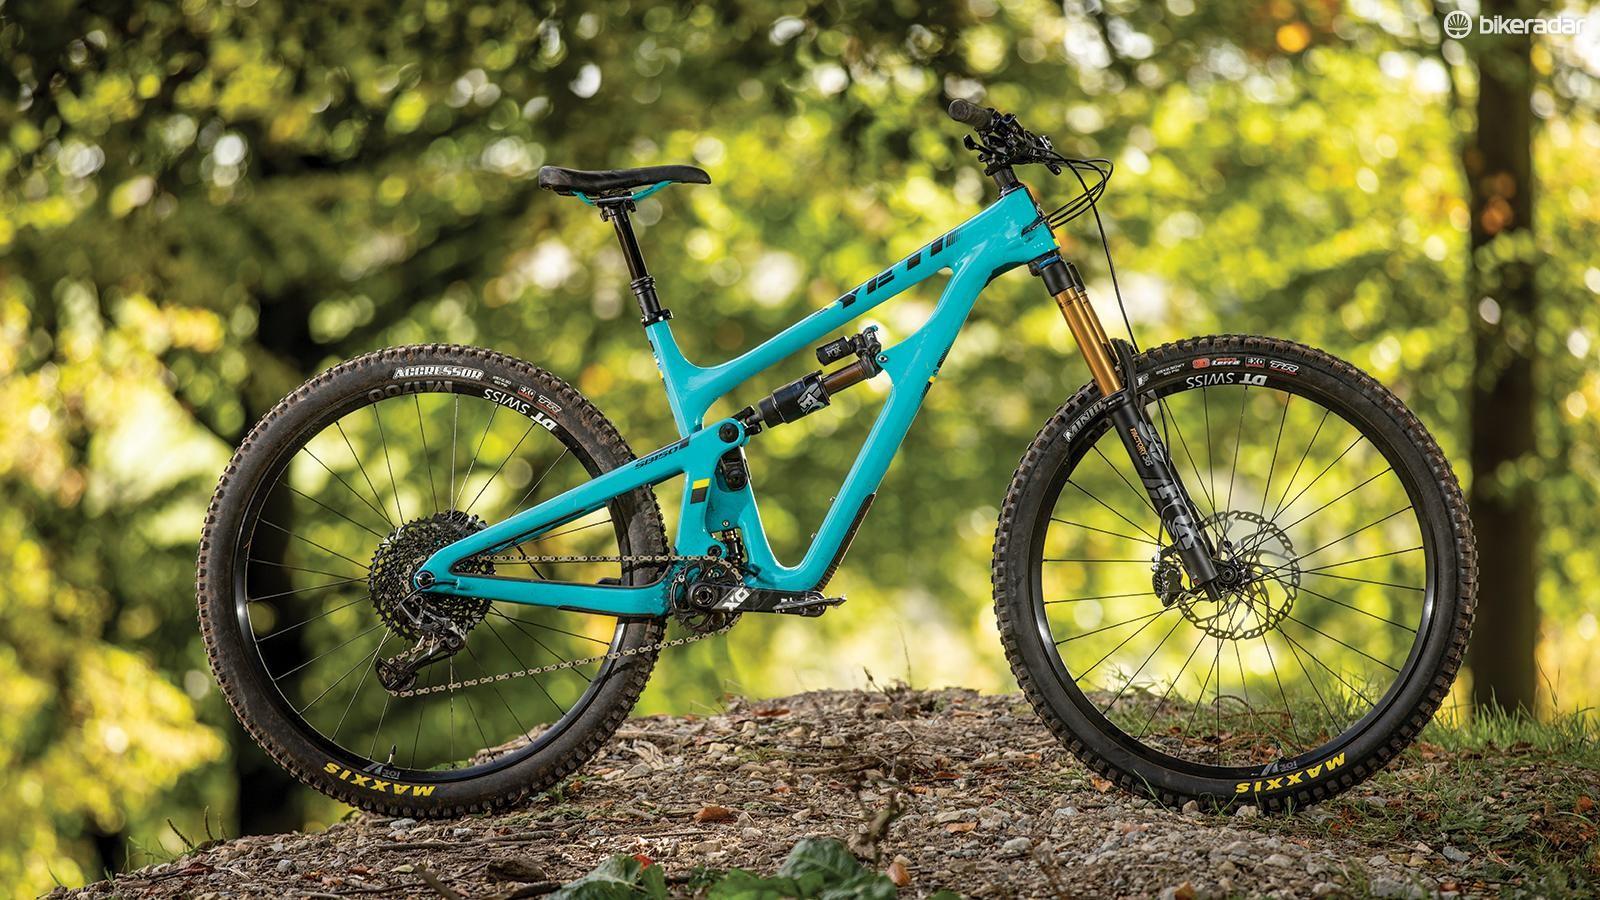 Yeti has added seriously progressive geometry to its latest bikes